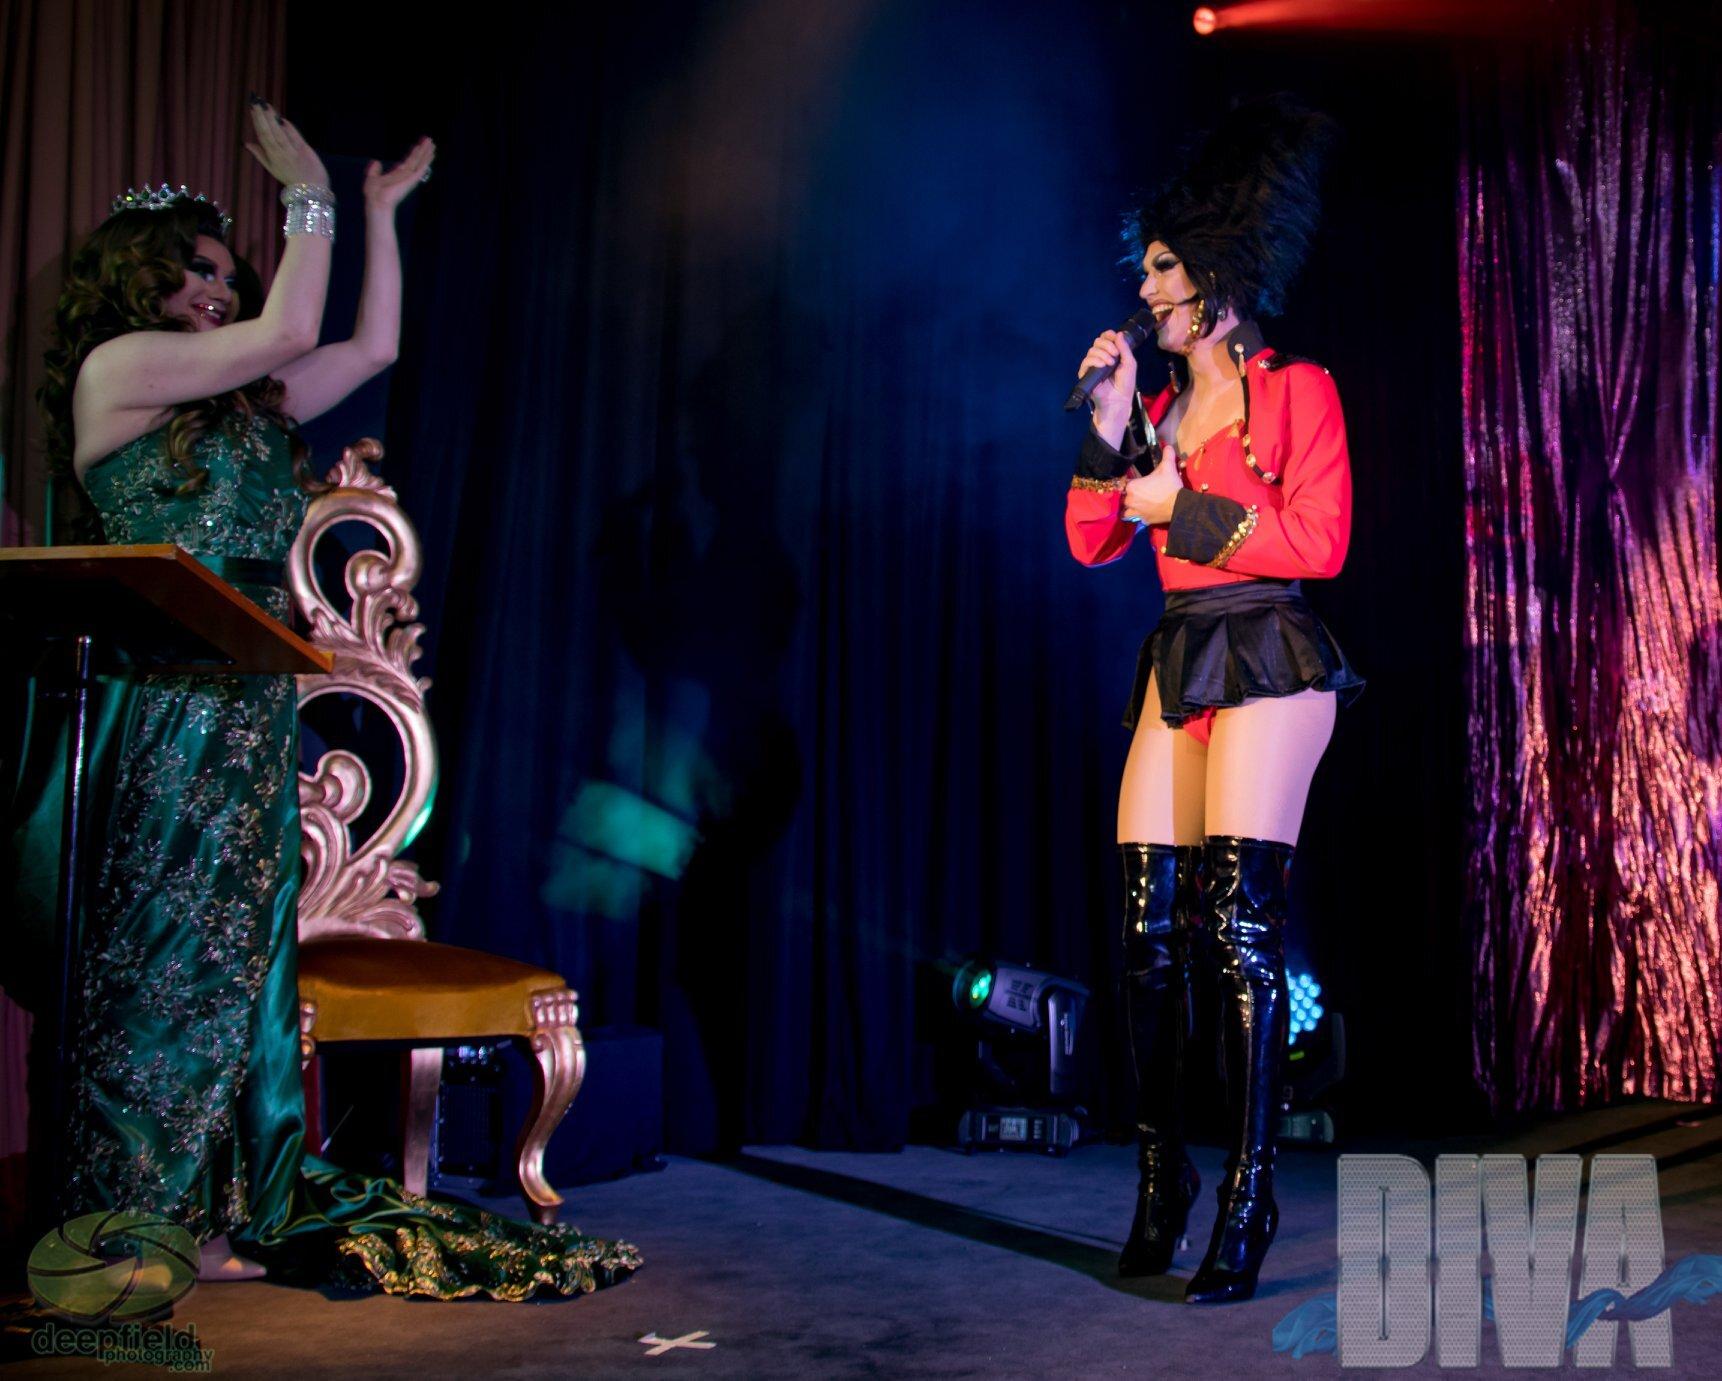 charisma-belle-sia-tequila-winner-win-entertainer-of-the-year-diva-awards-sydney-drag-queen-royalty-best-hire-drag-race-australia-1.jpg